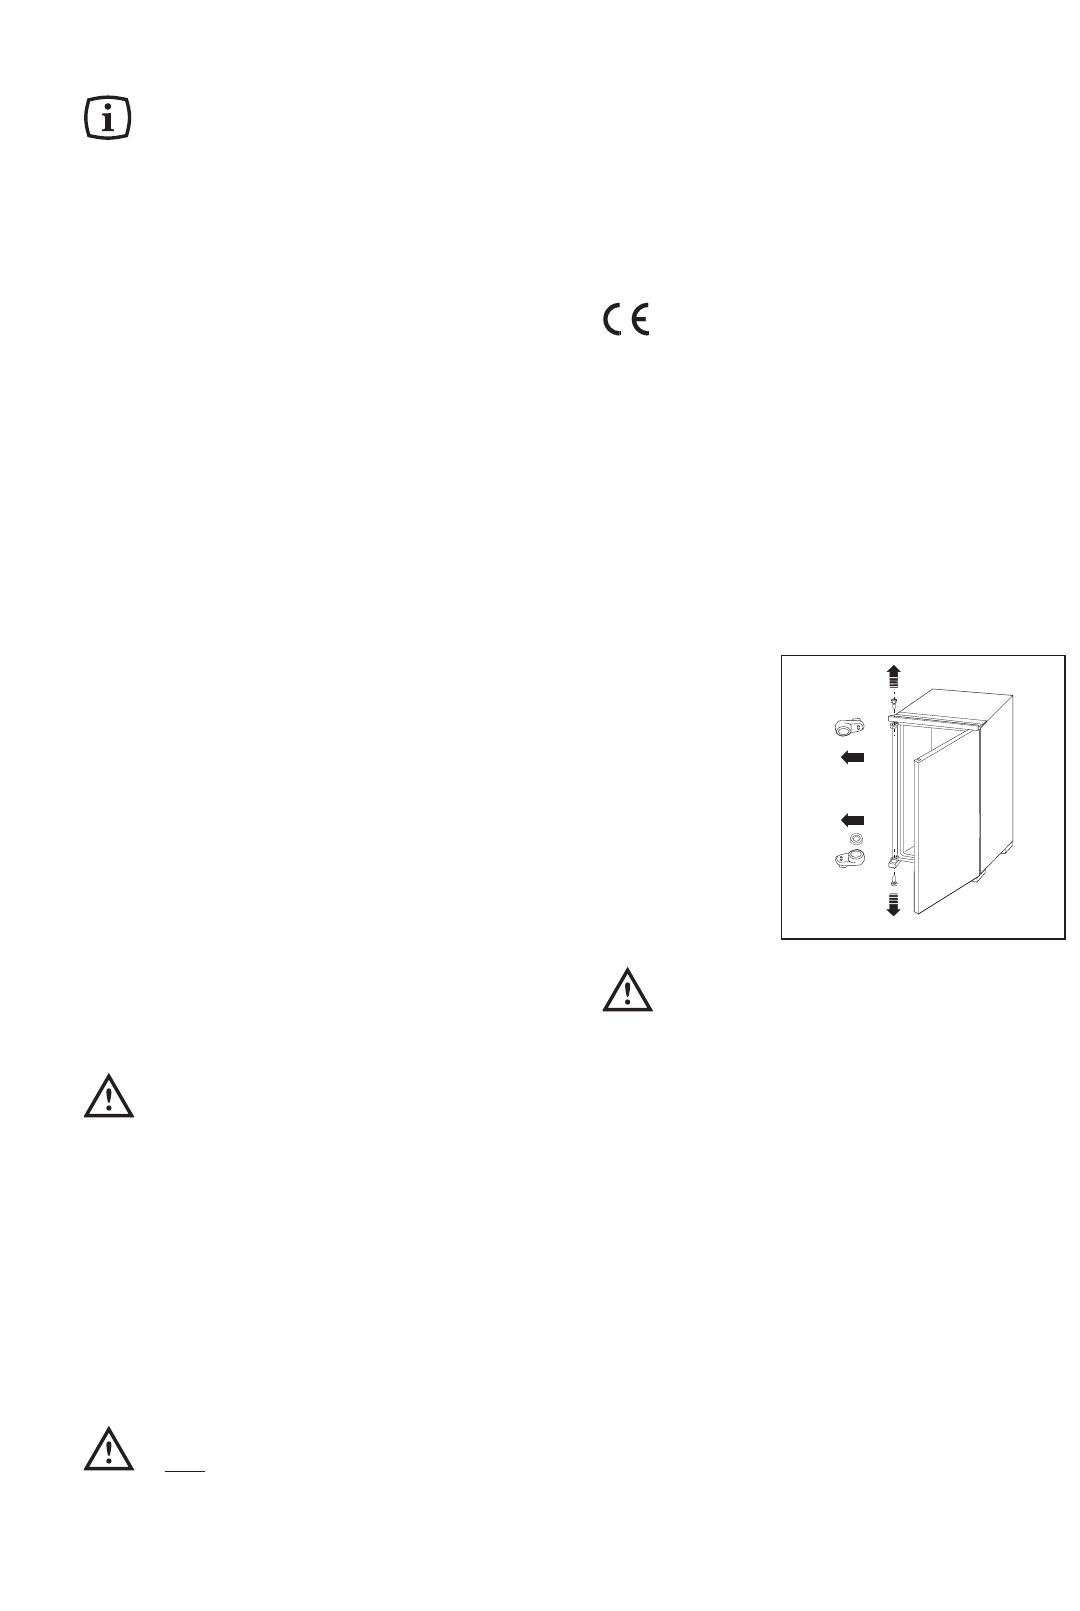 handleiding kuppersbusch ike 157 6 pagina 11 van 14 deutsch. Black Bedroom Furniture Sets. Home Design Ideas